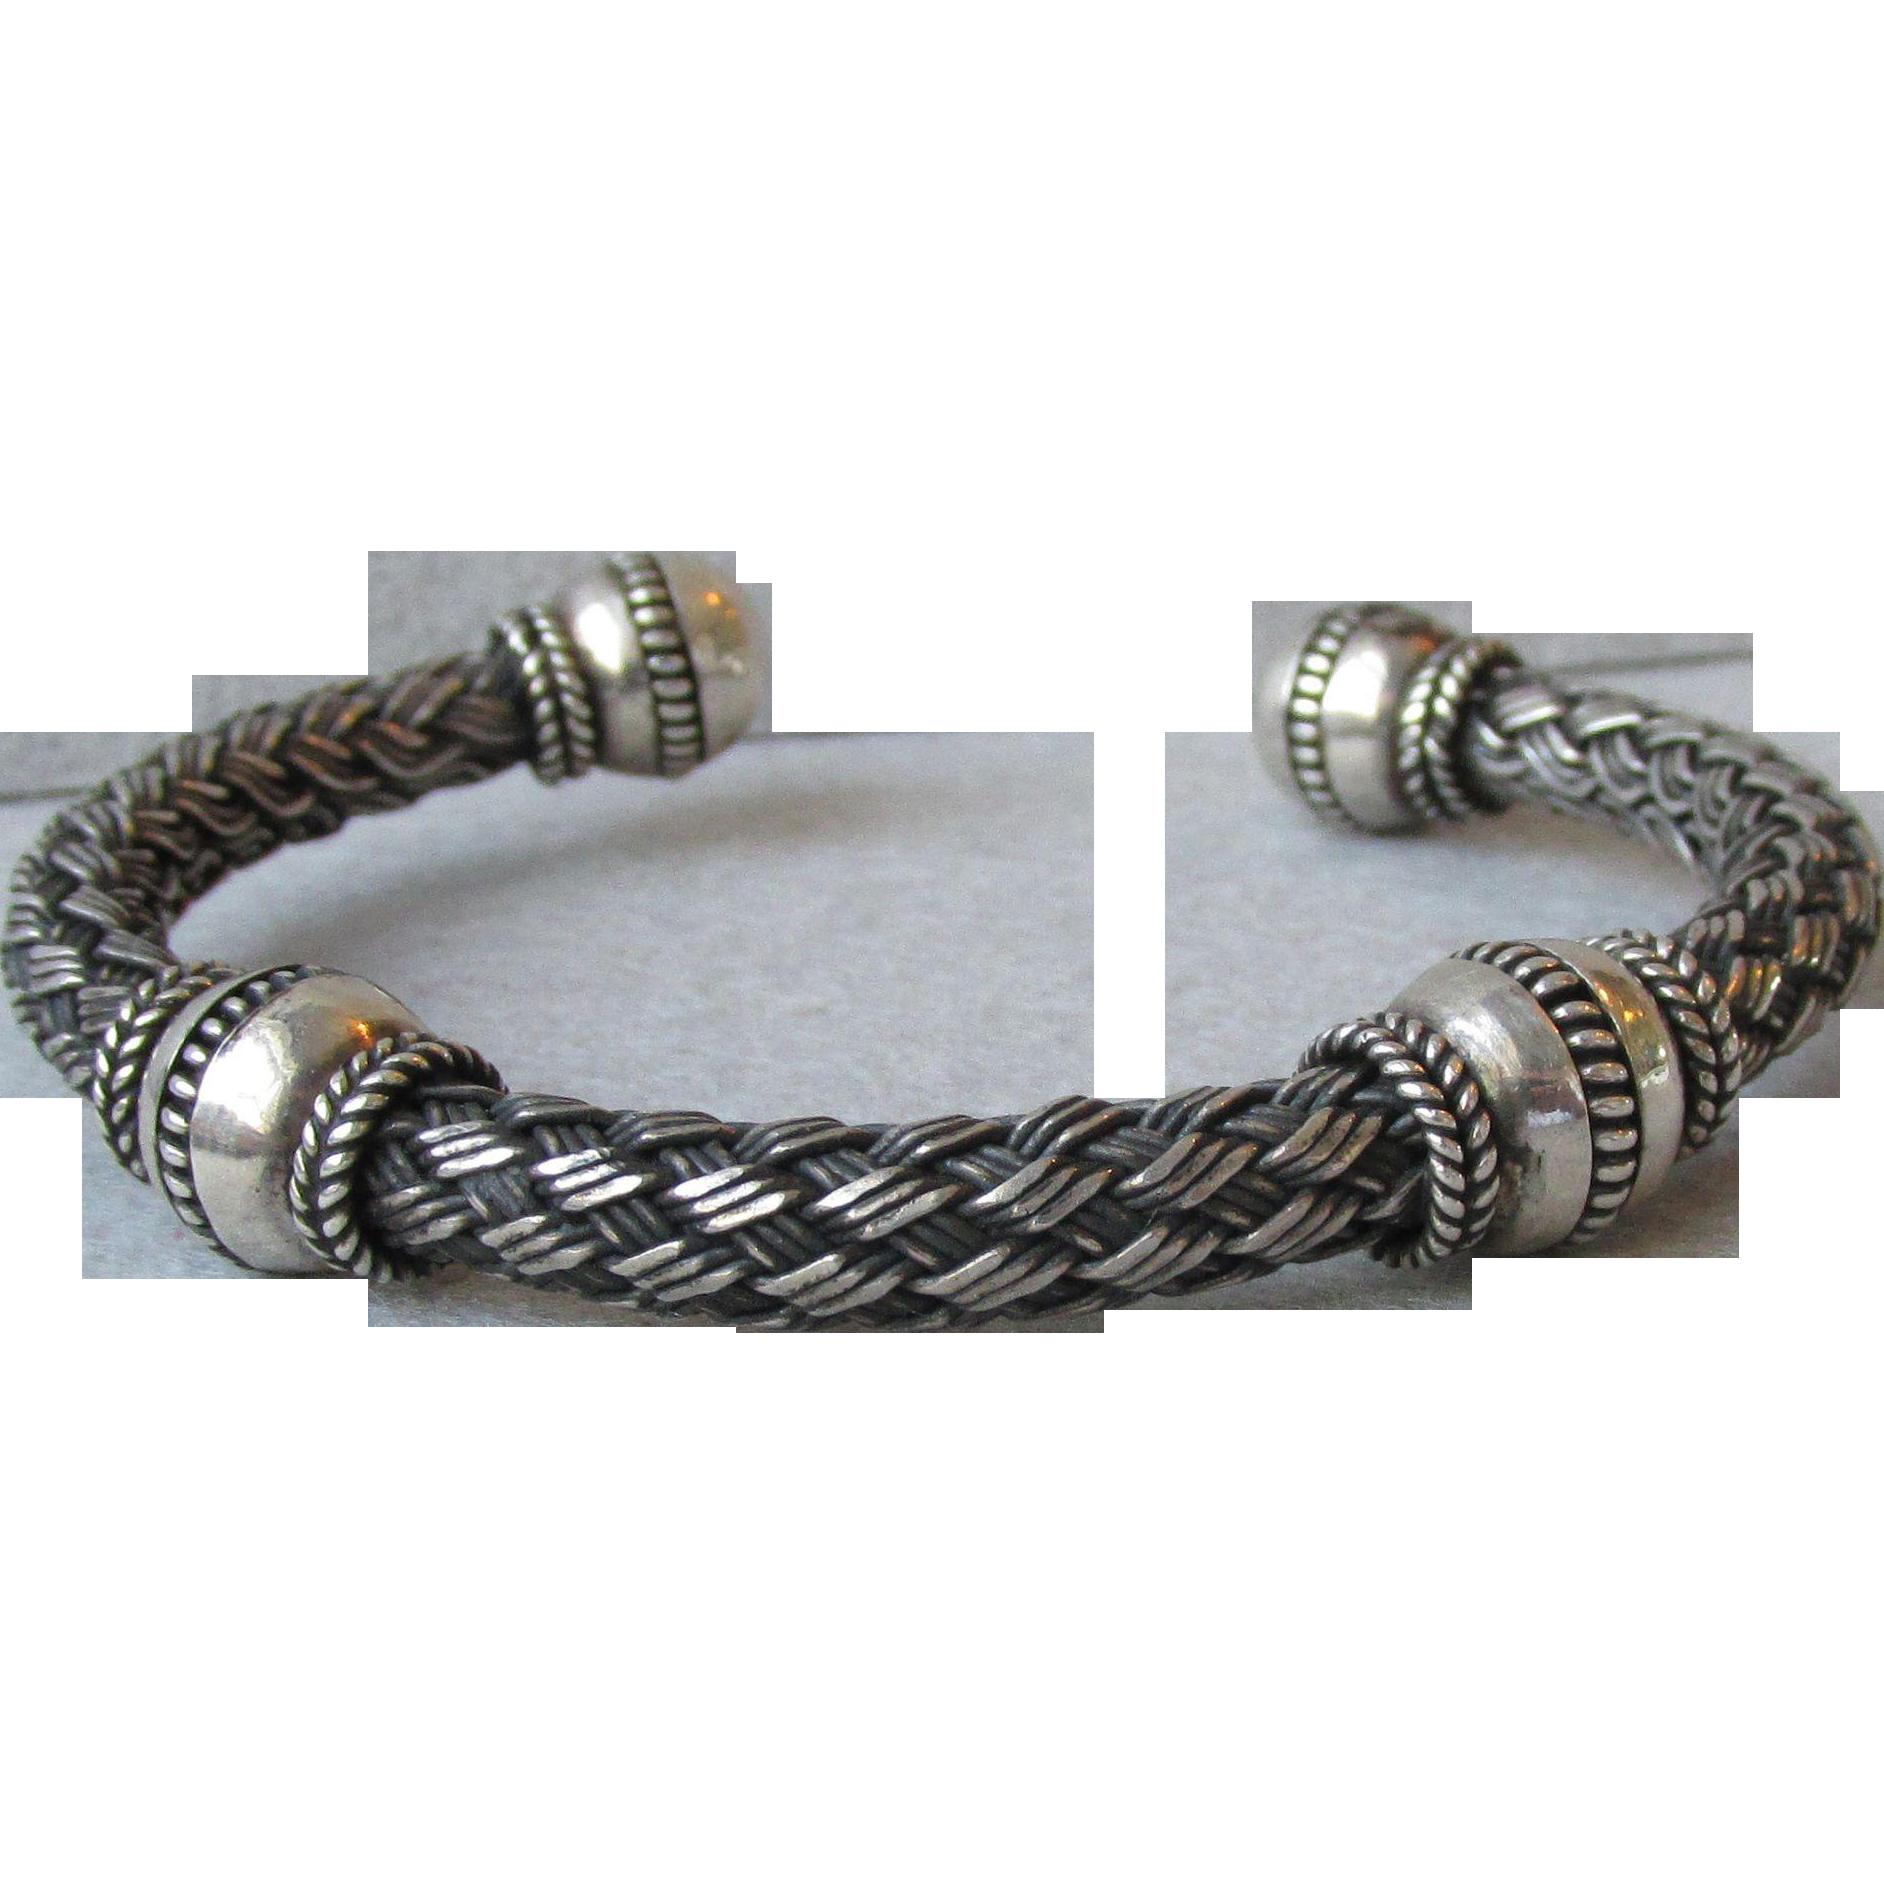 "Heavy Bali Sterling Silver Open Braided Vintage Bangle Bracelet, Unisex 7""-8"""